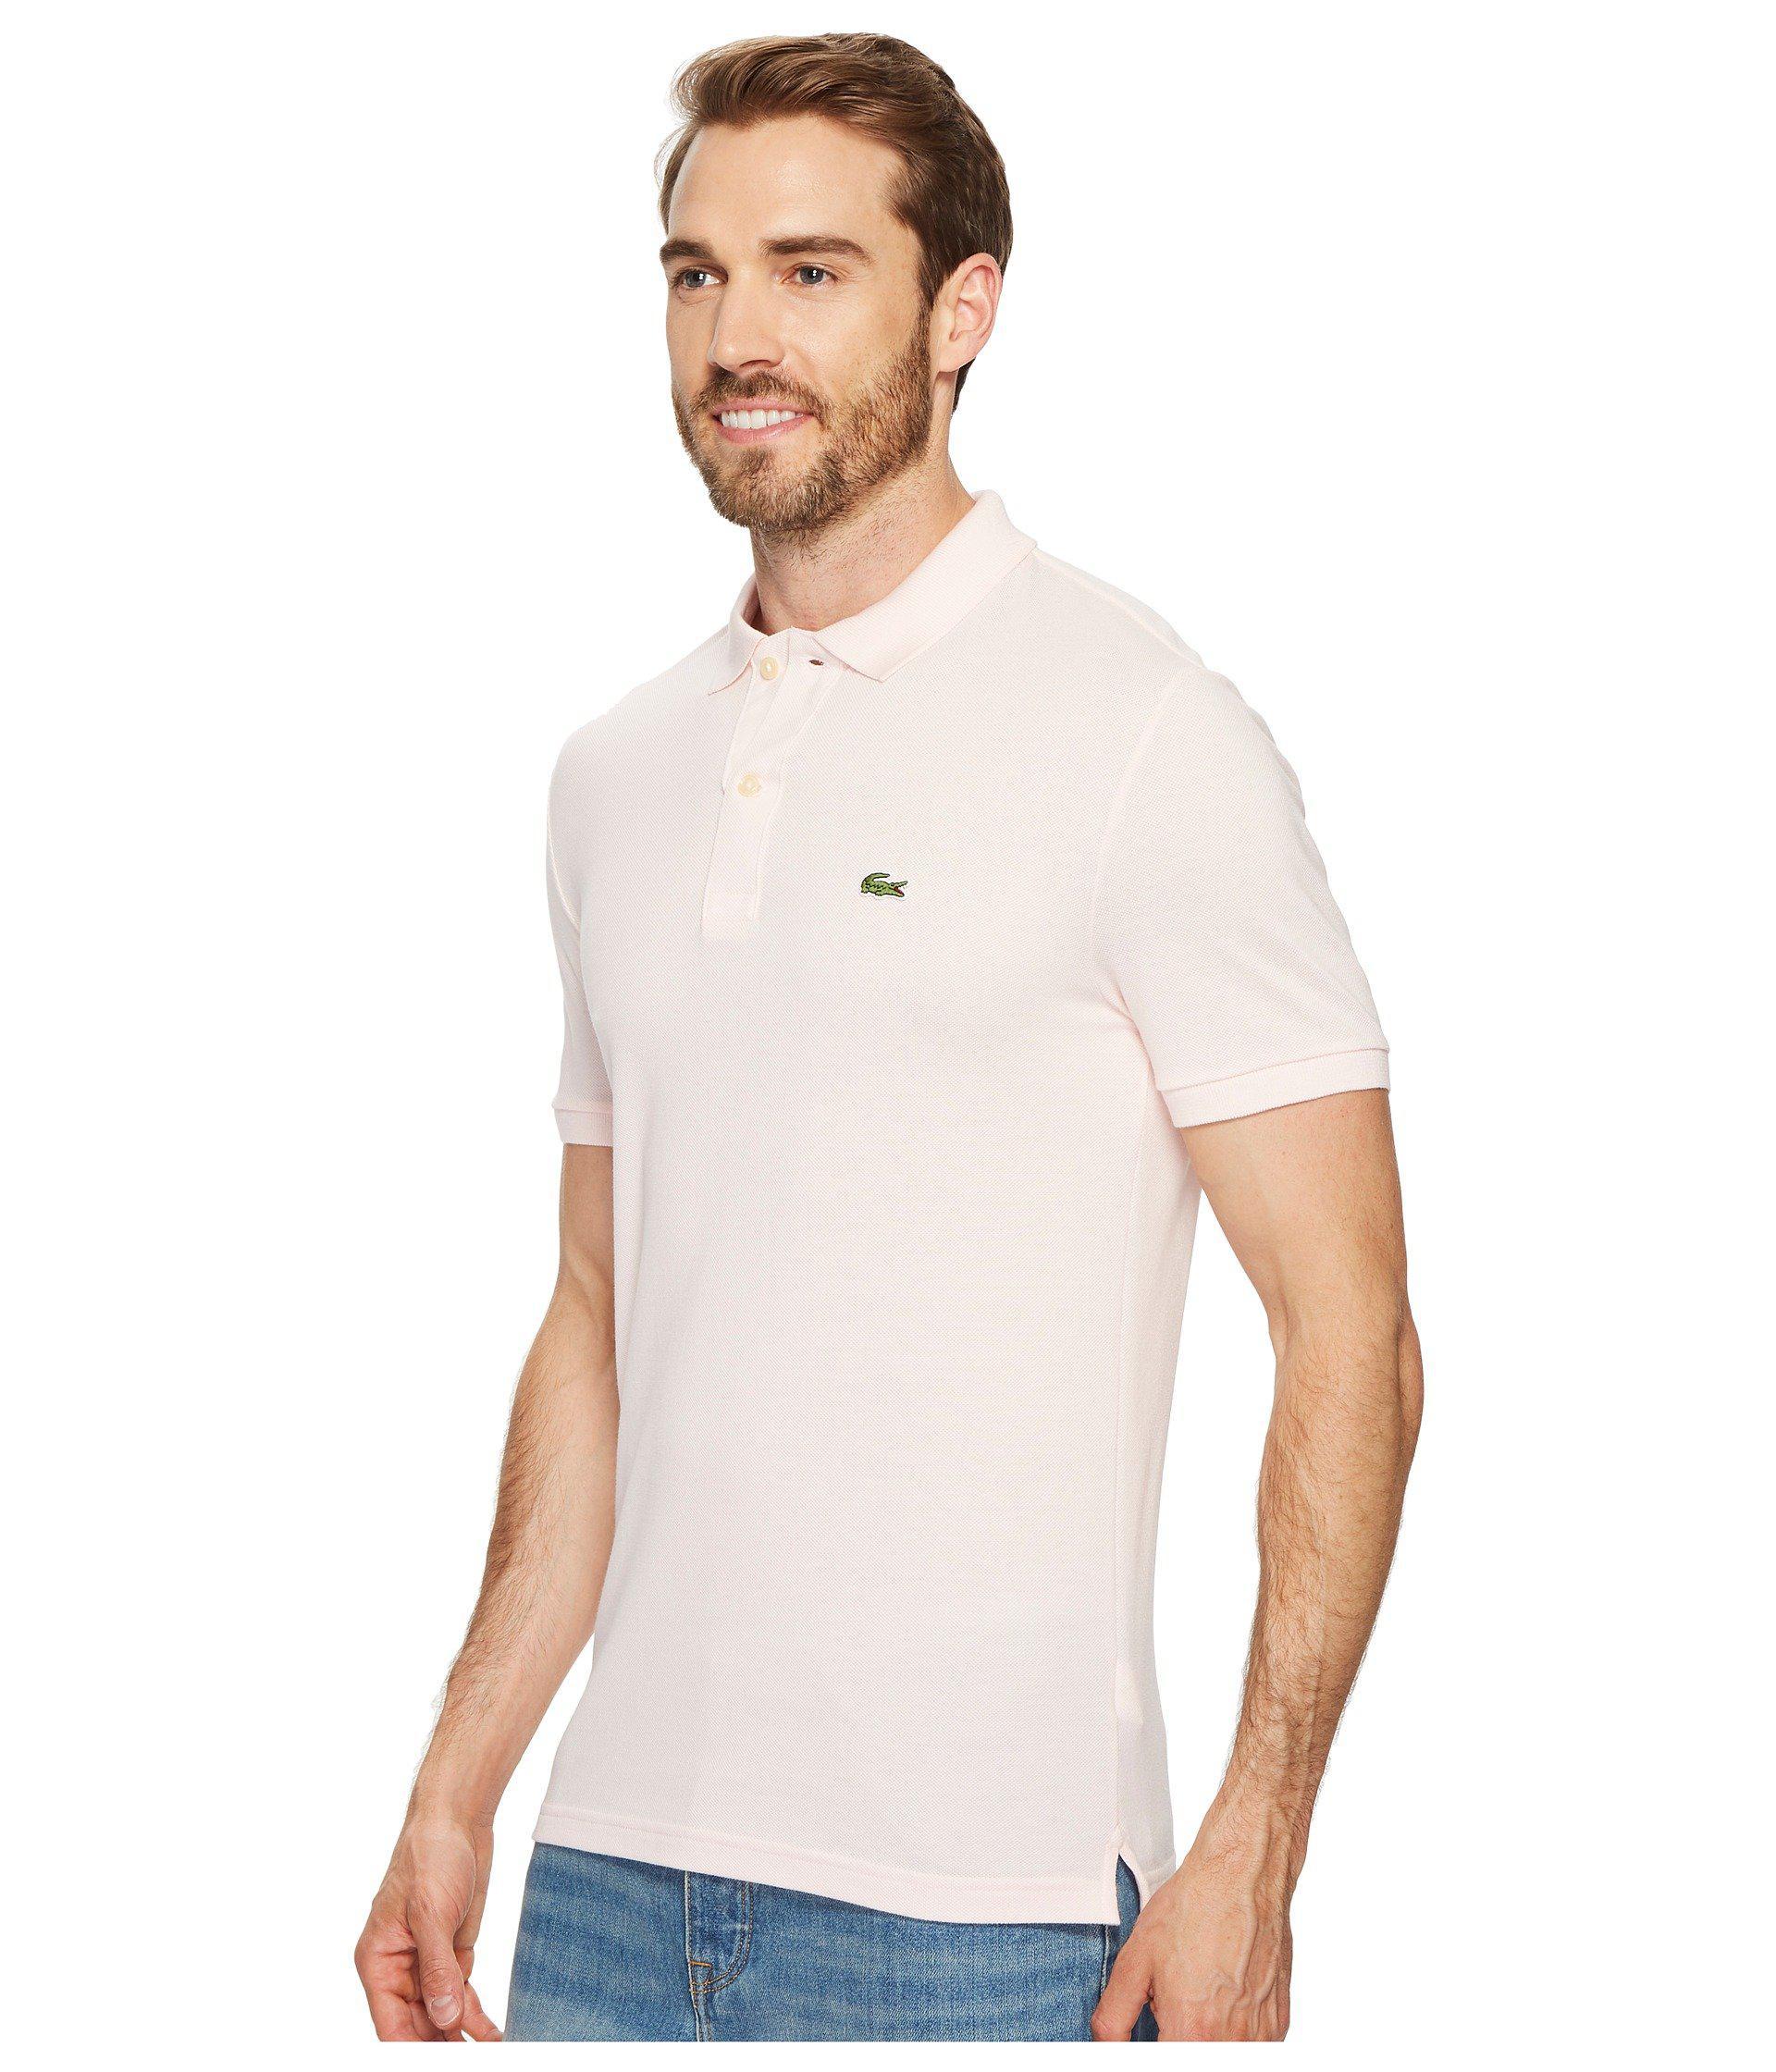 wholesale dealer 0edb5 c4585 Lacoste Shirt Slim Fit Pique Polo – EDGE Engineering and ...